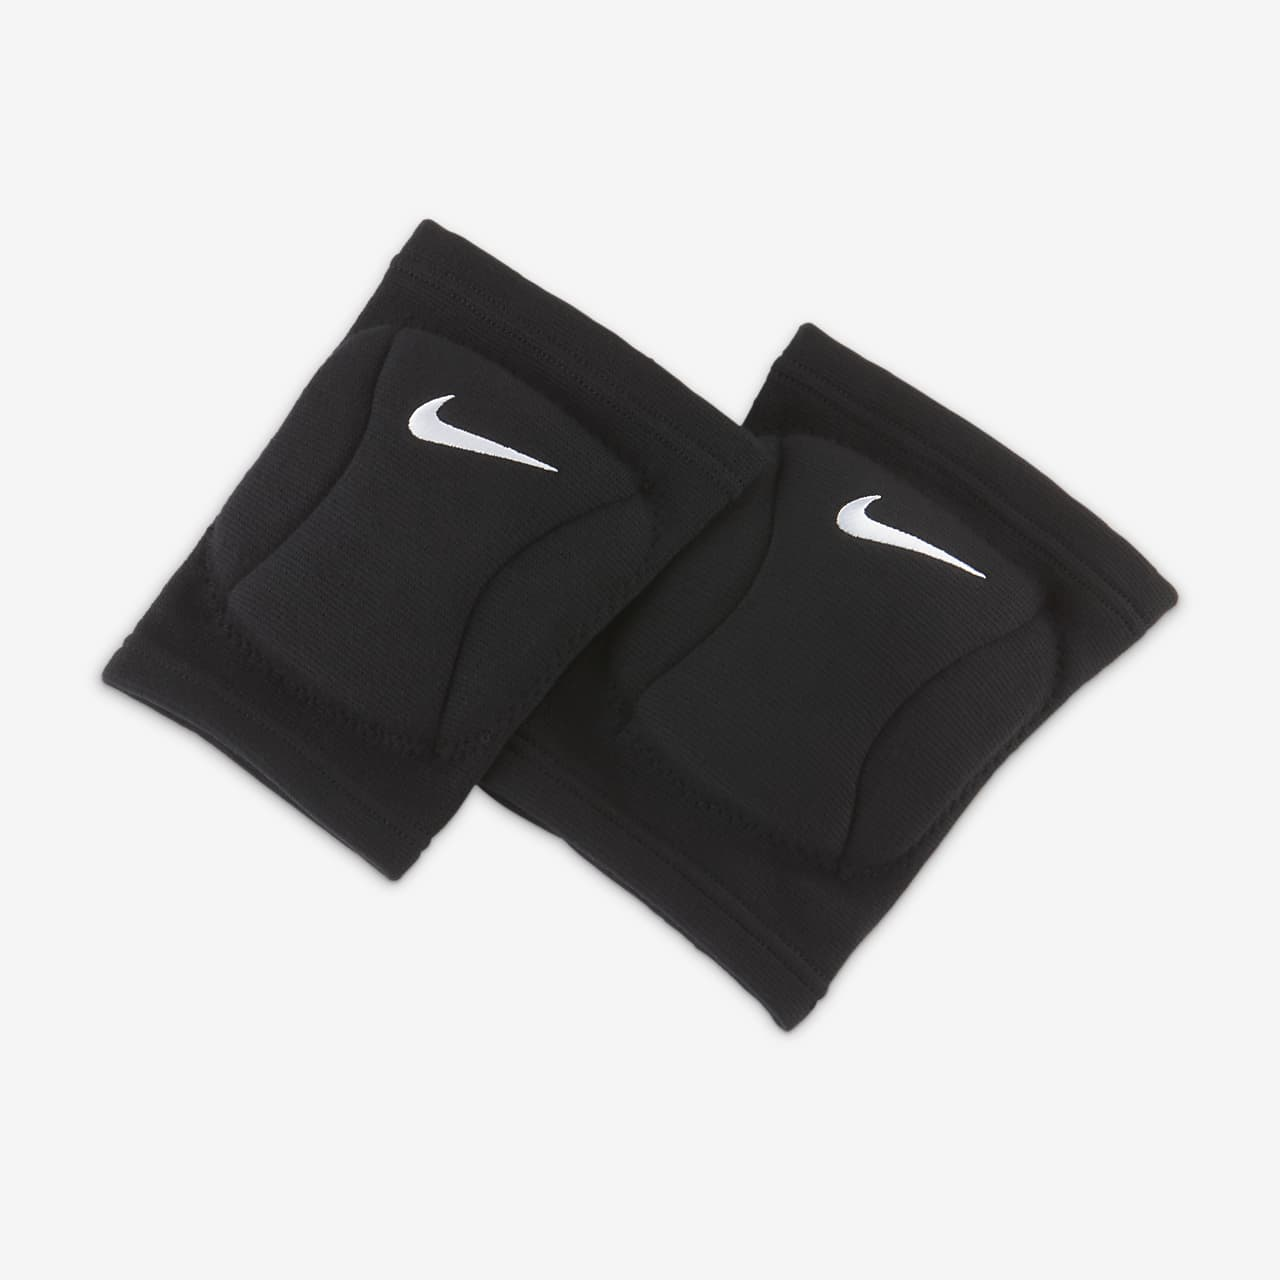 Nike Streak Volleyball Knee Pads Nike Gb